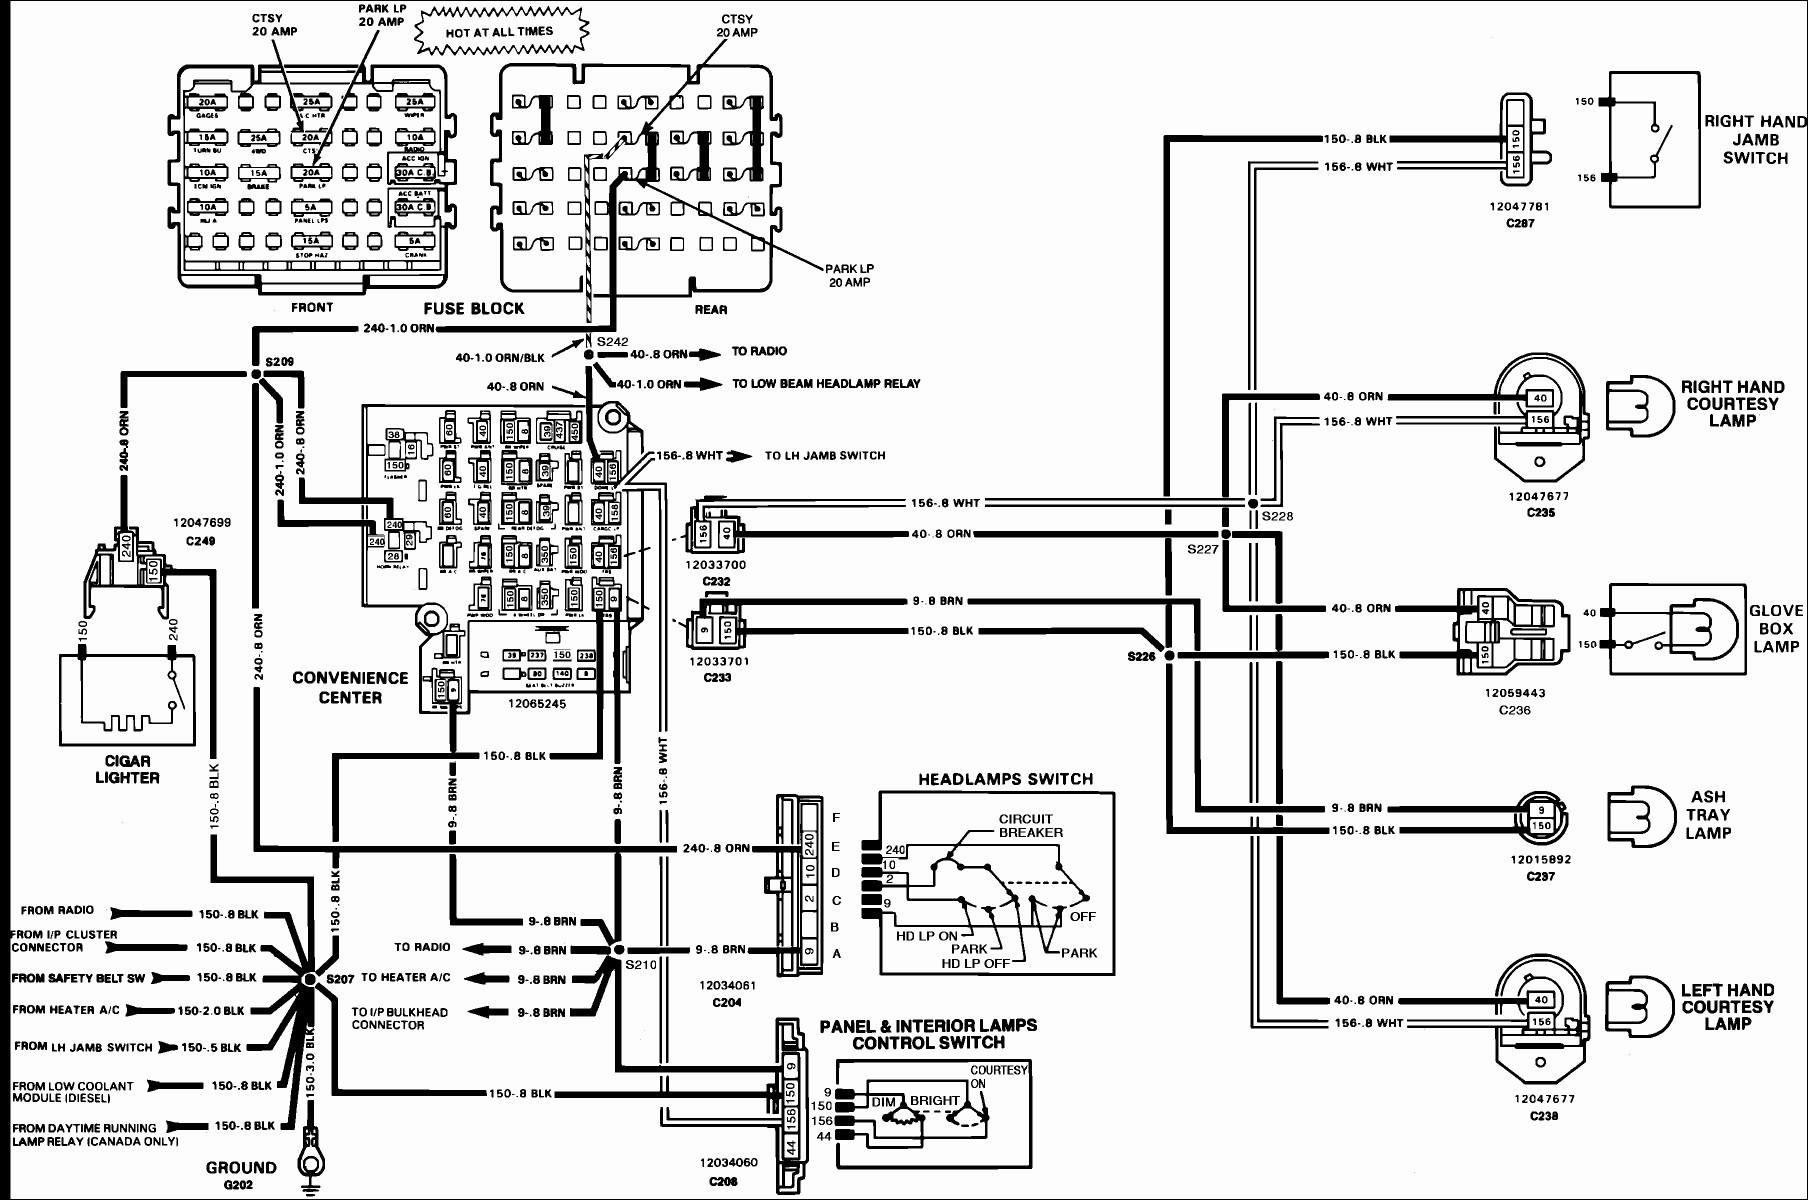 Spark Plug Wiring Diagram For 95 Chevy Silverado